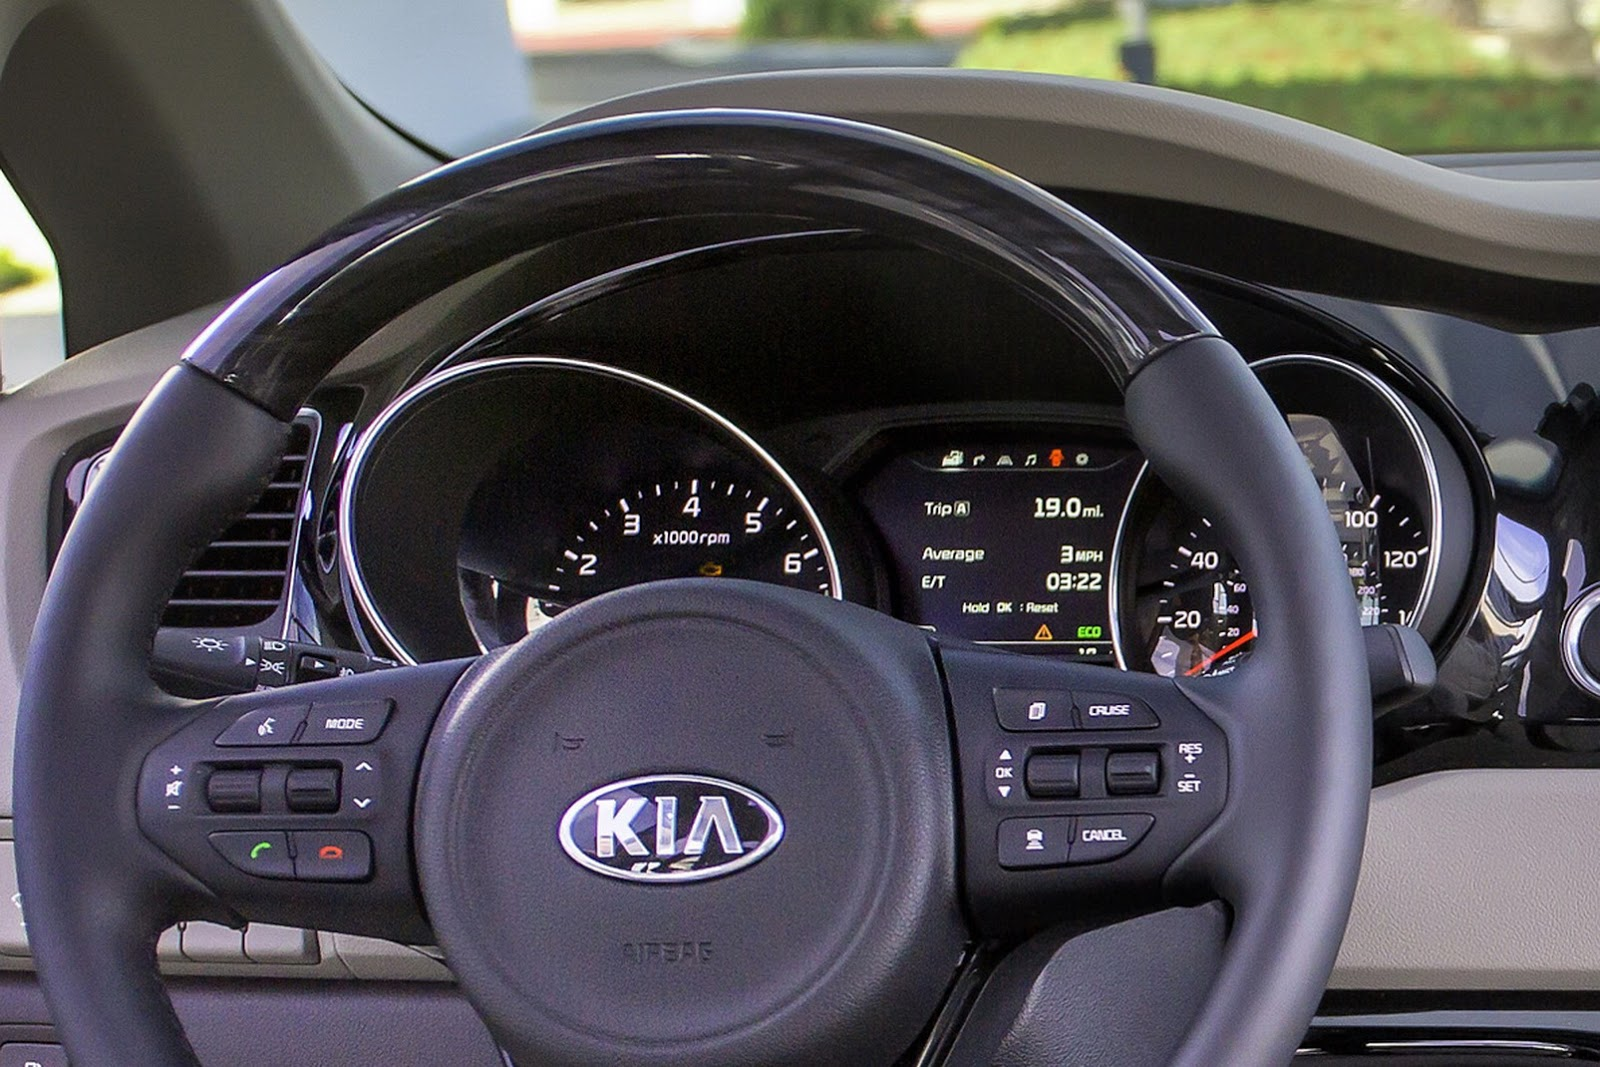 10 best new interiors of 2015  according to ward u0026 39 s auto